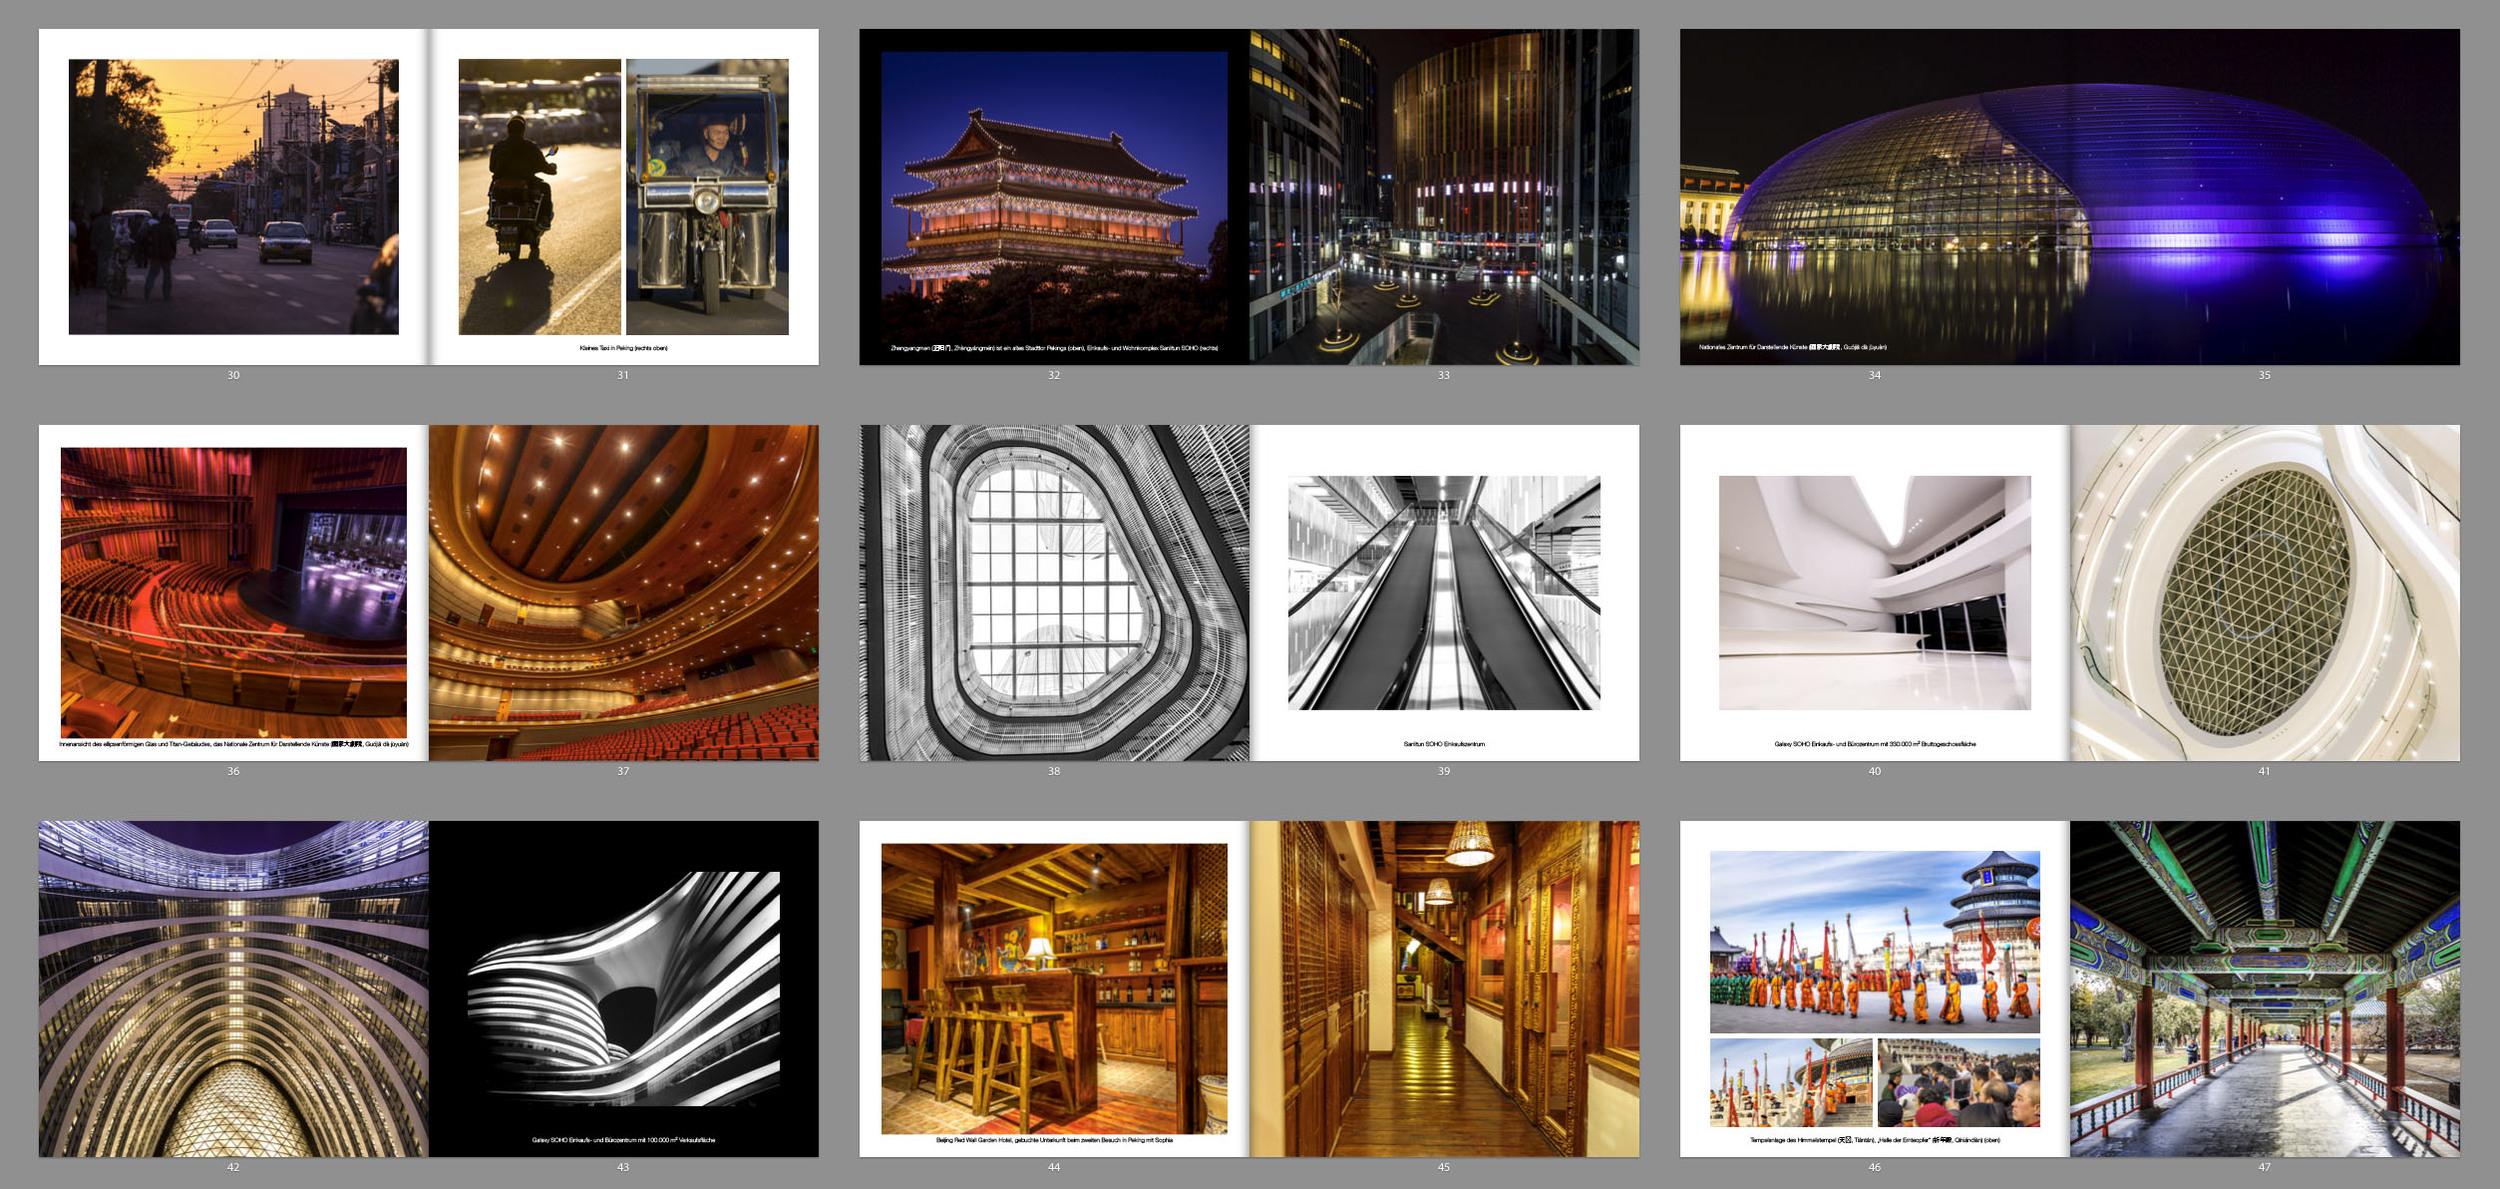 China Photobook Page 30-47.jpg